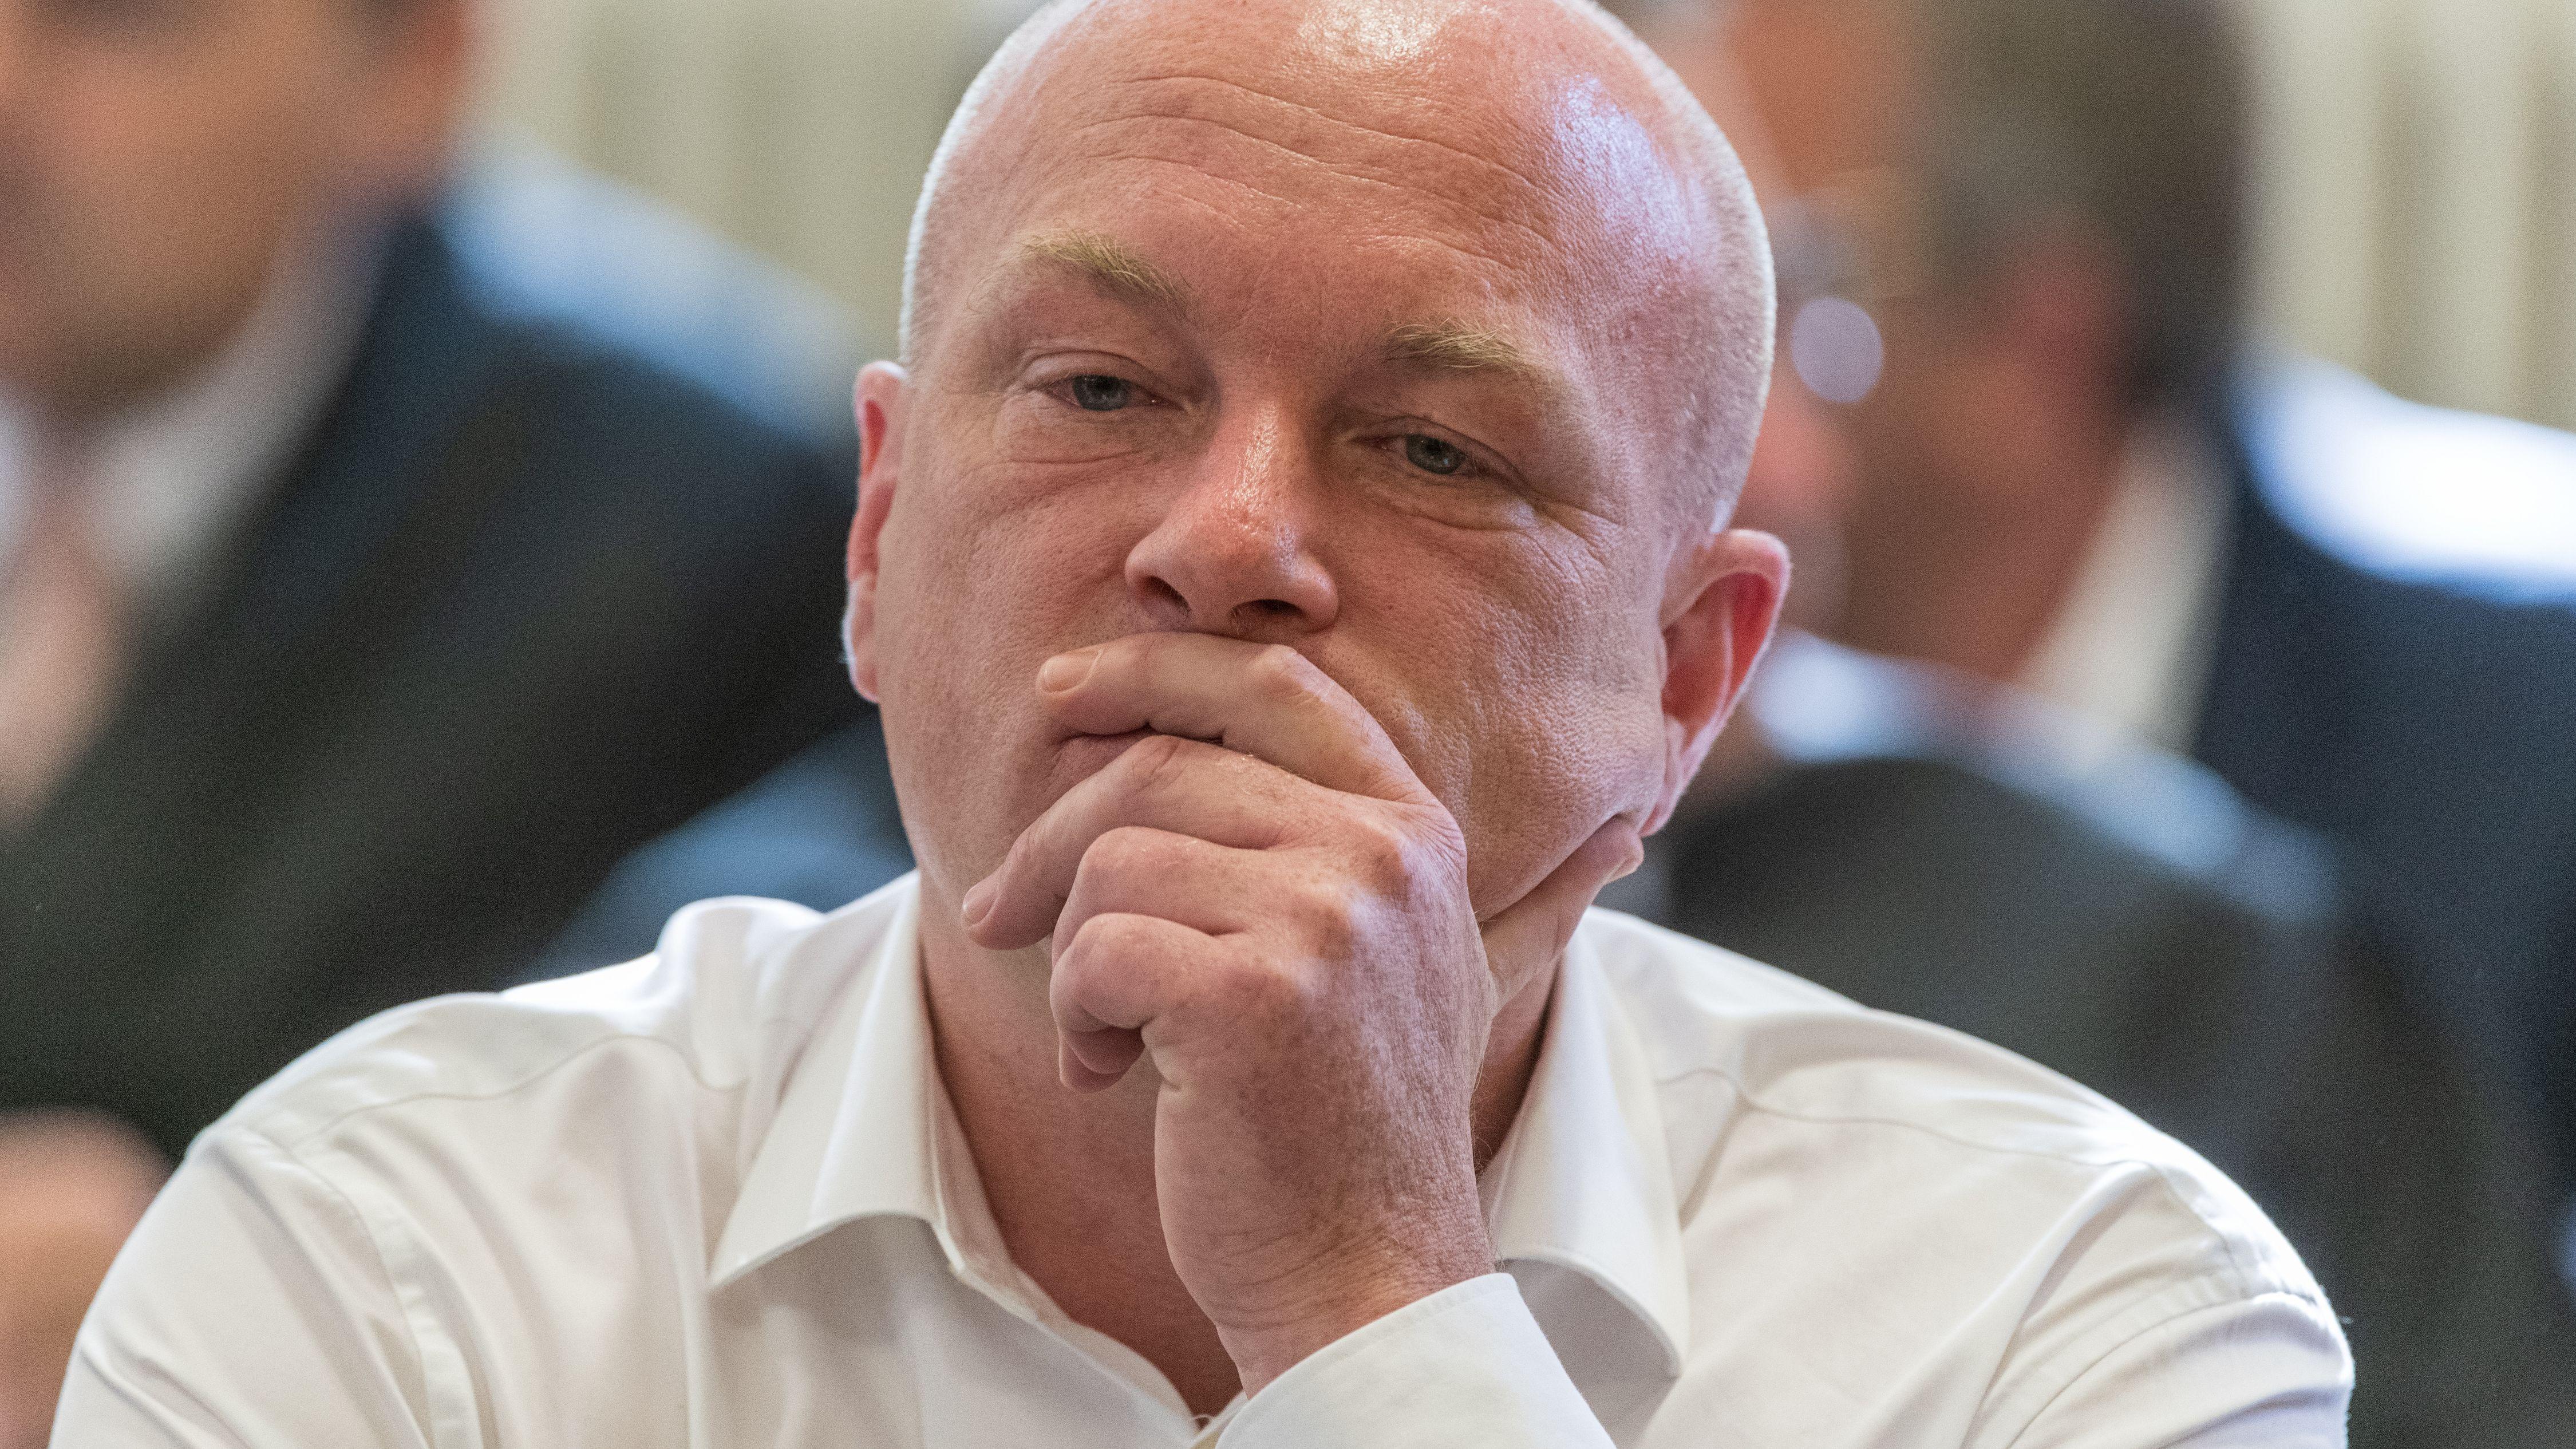 OB Wolbergs während der Urteilsverkündung im Gerichtssaal